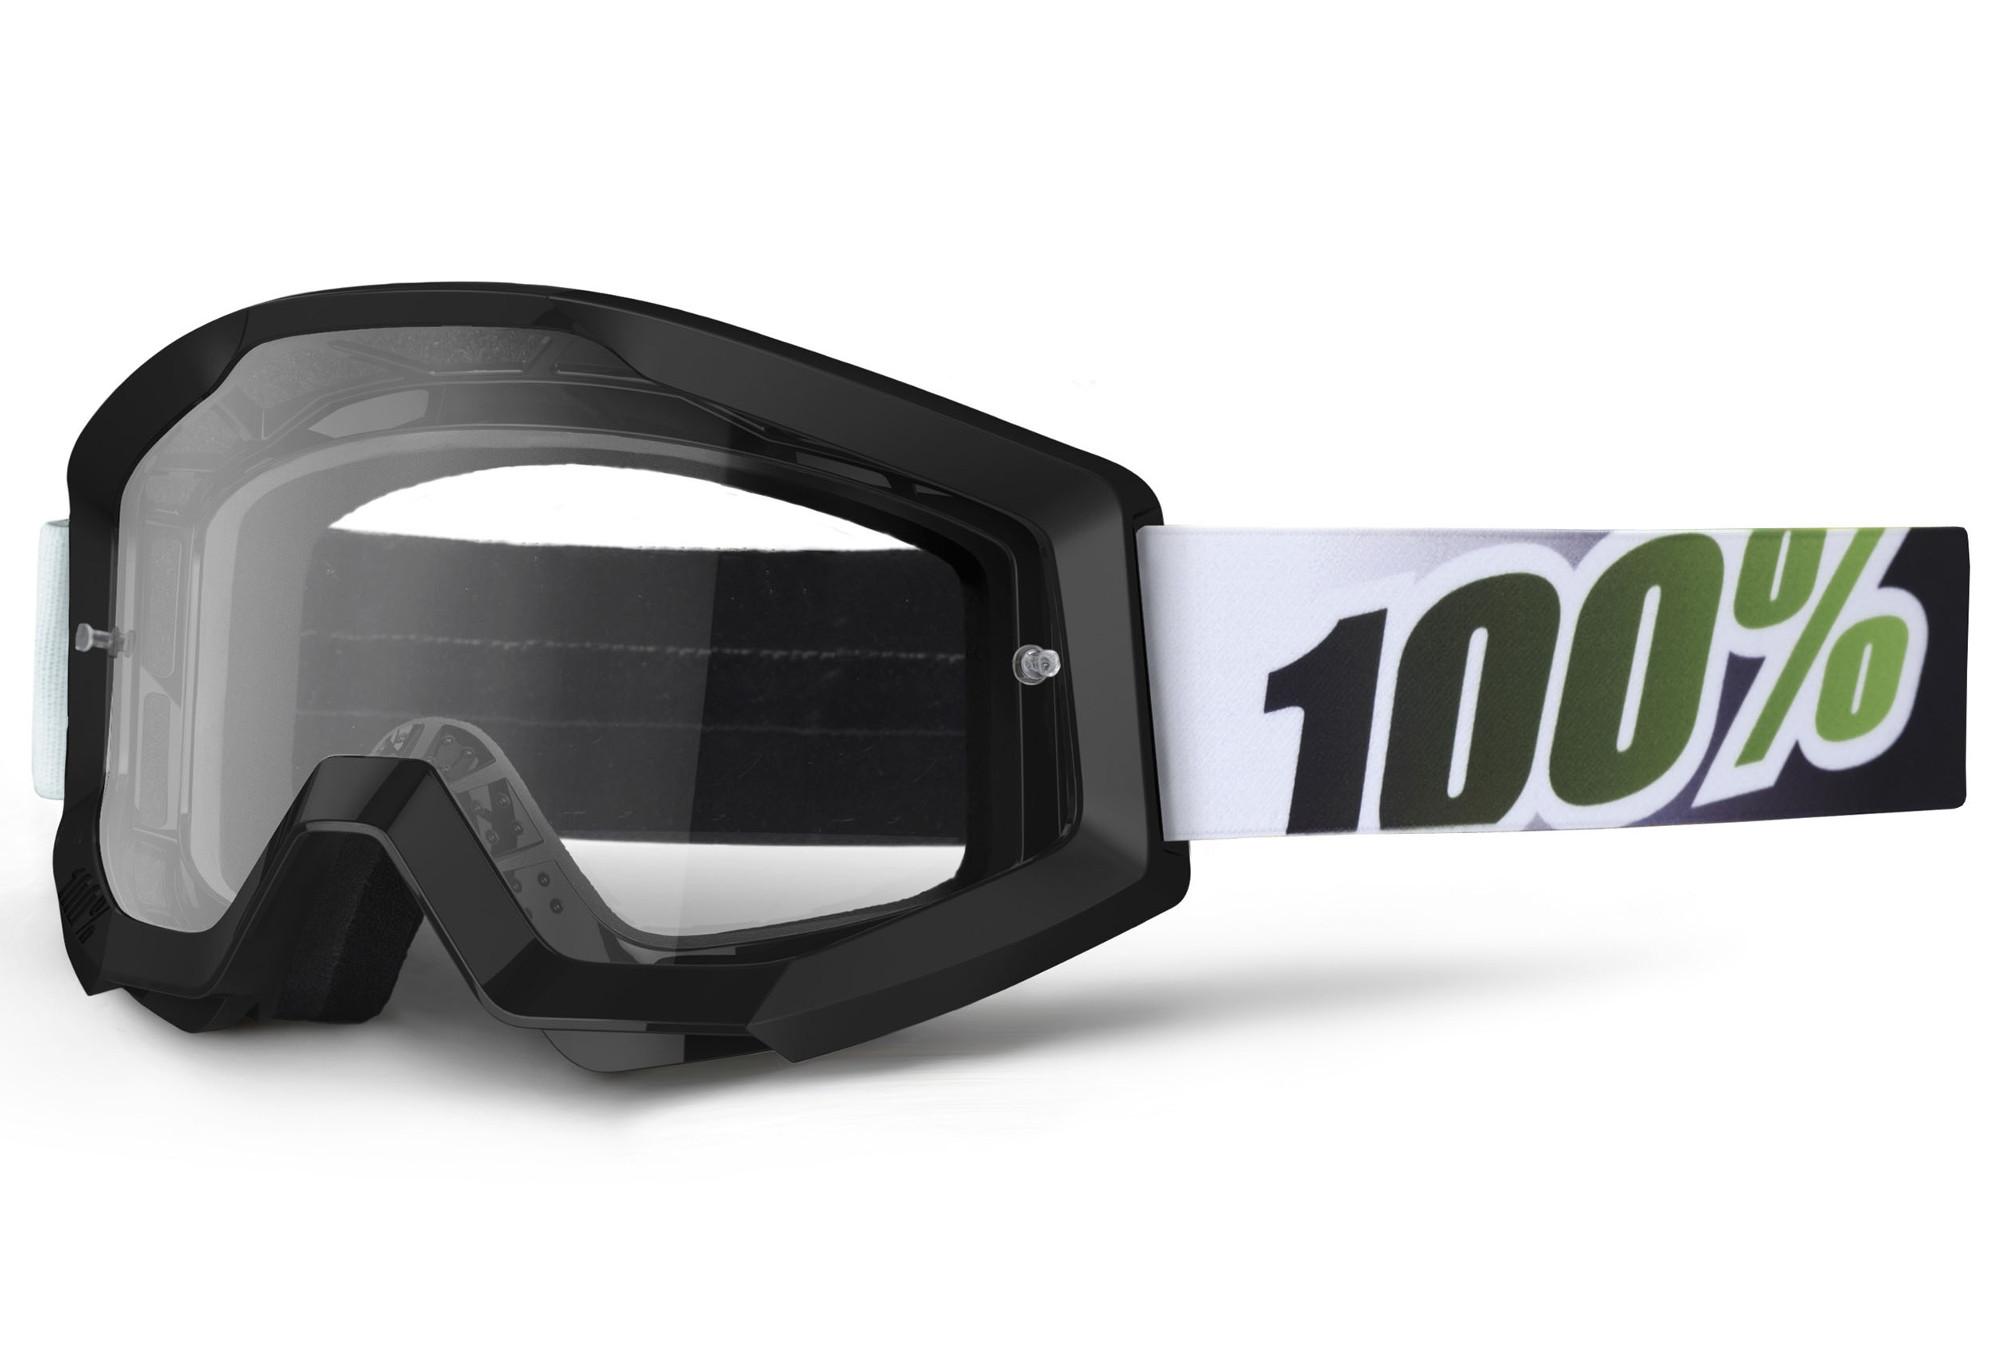 100 masque strata noir vert cran transparent. Black Bedroom Furniture Sets. Home Design Ideas